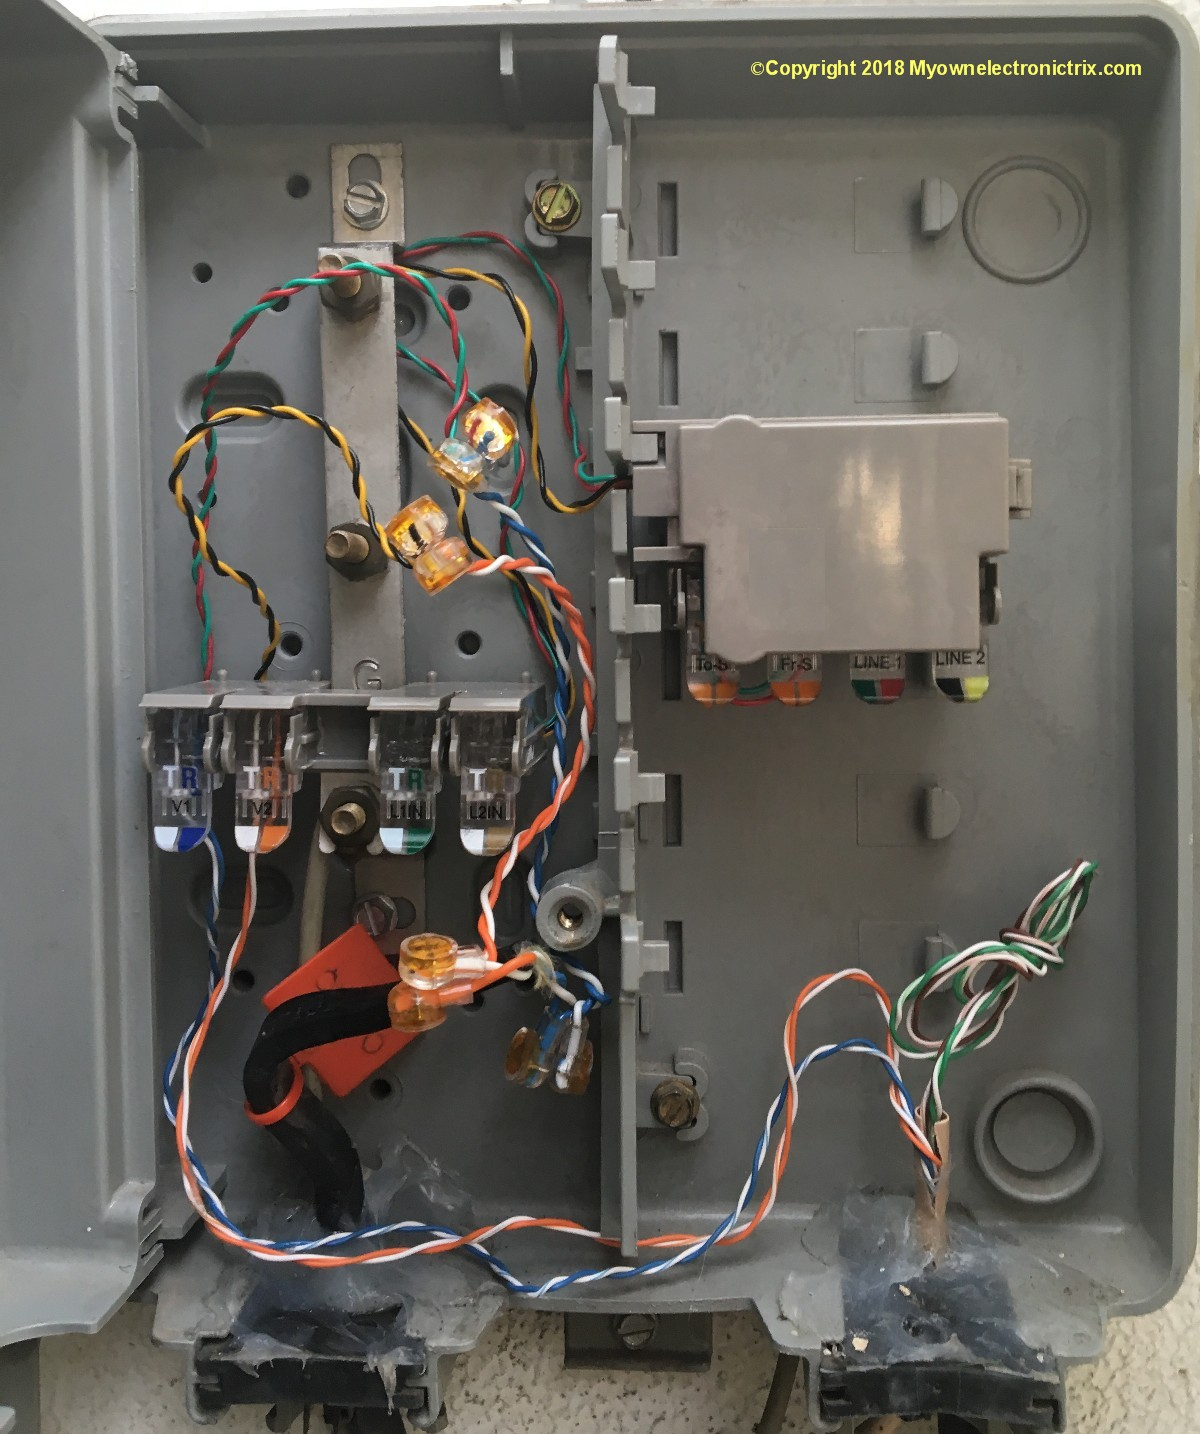 Telephone Wiring Diagram Outside Box   Wiring Diagram - Telephone Wiring Diagram Outside Box